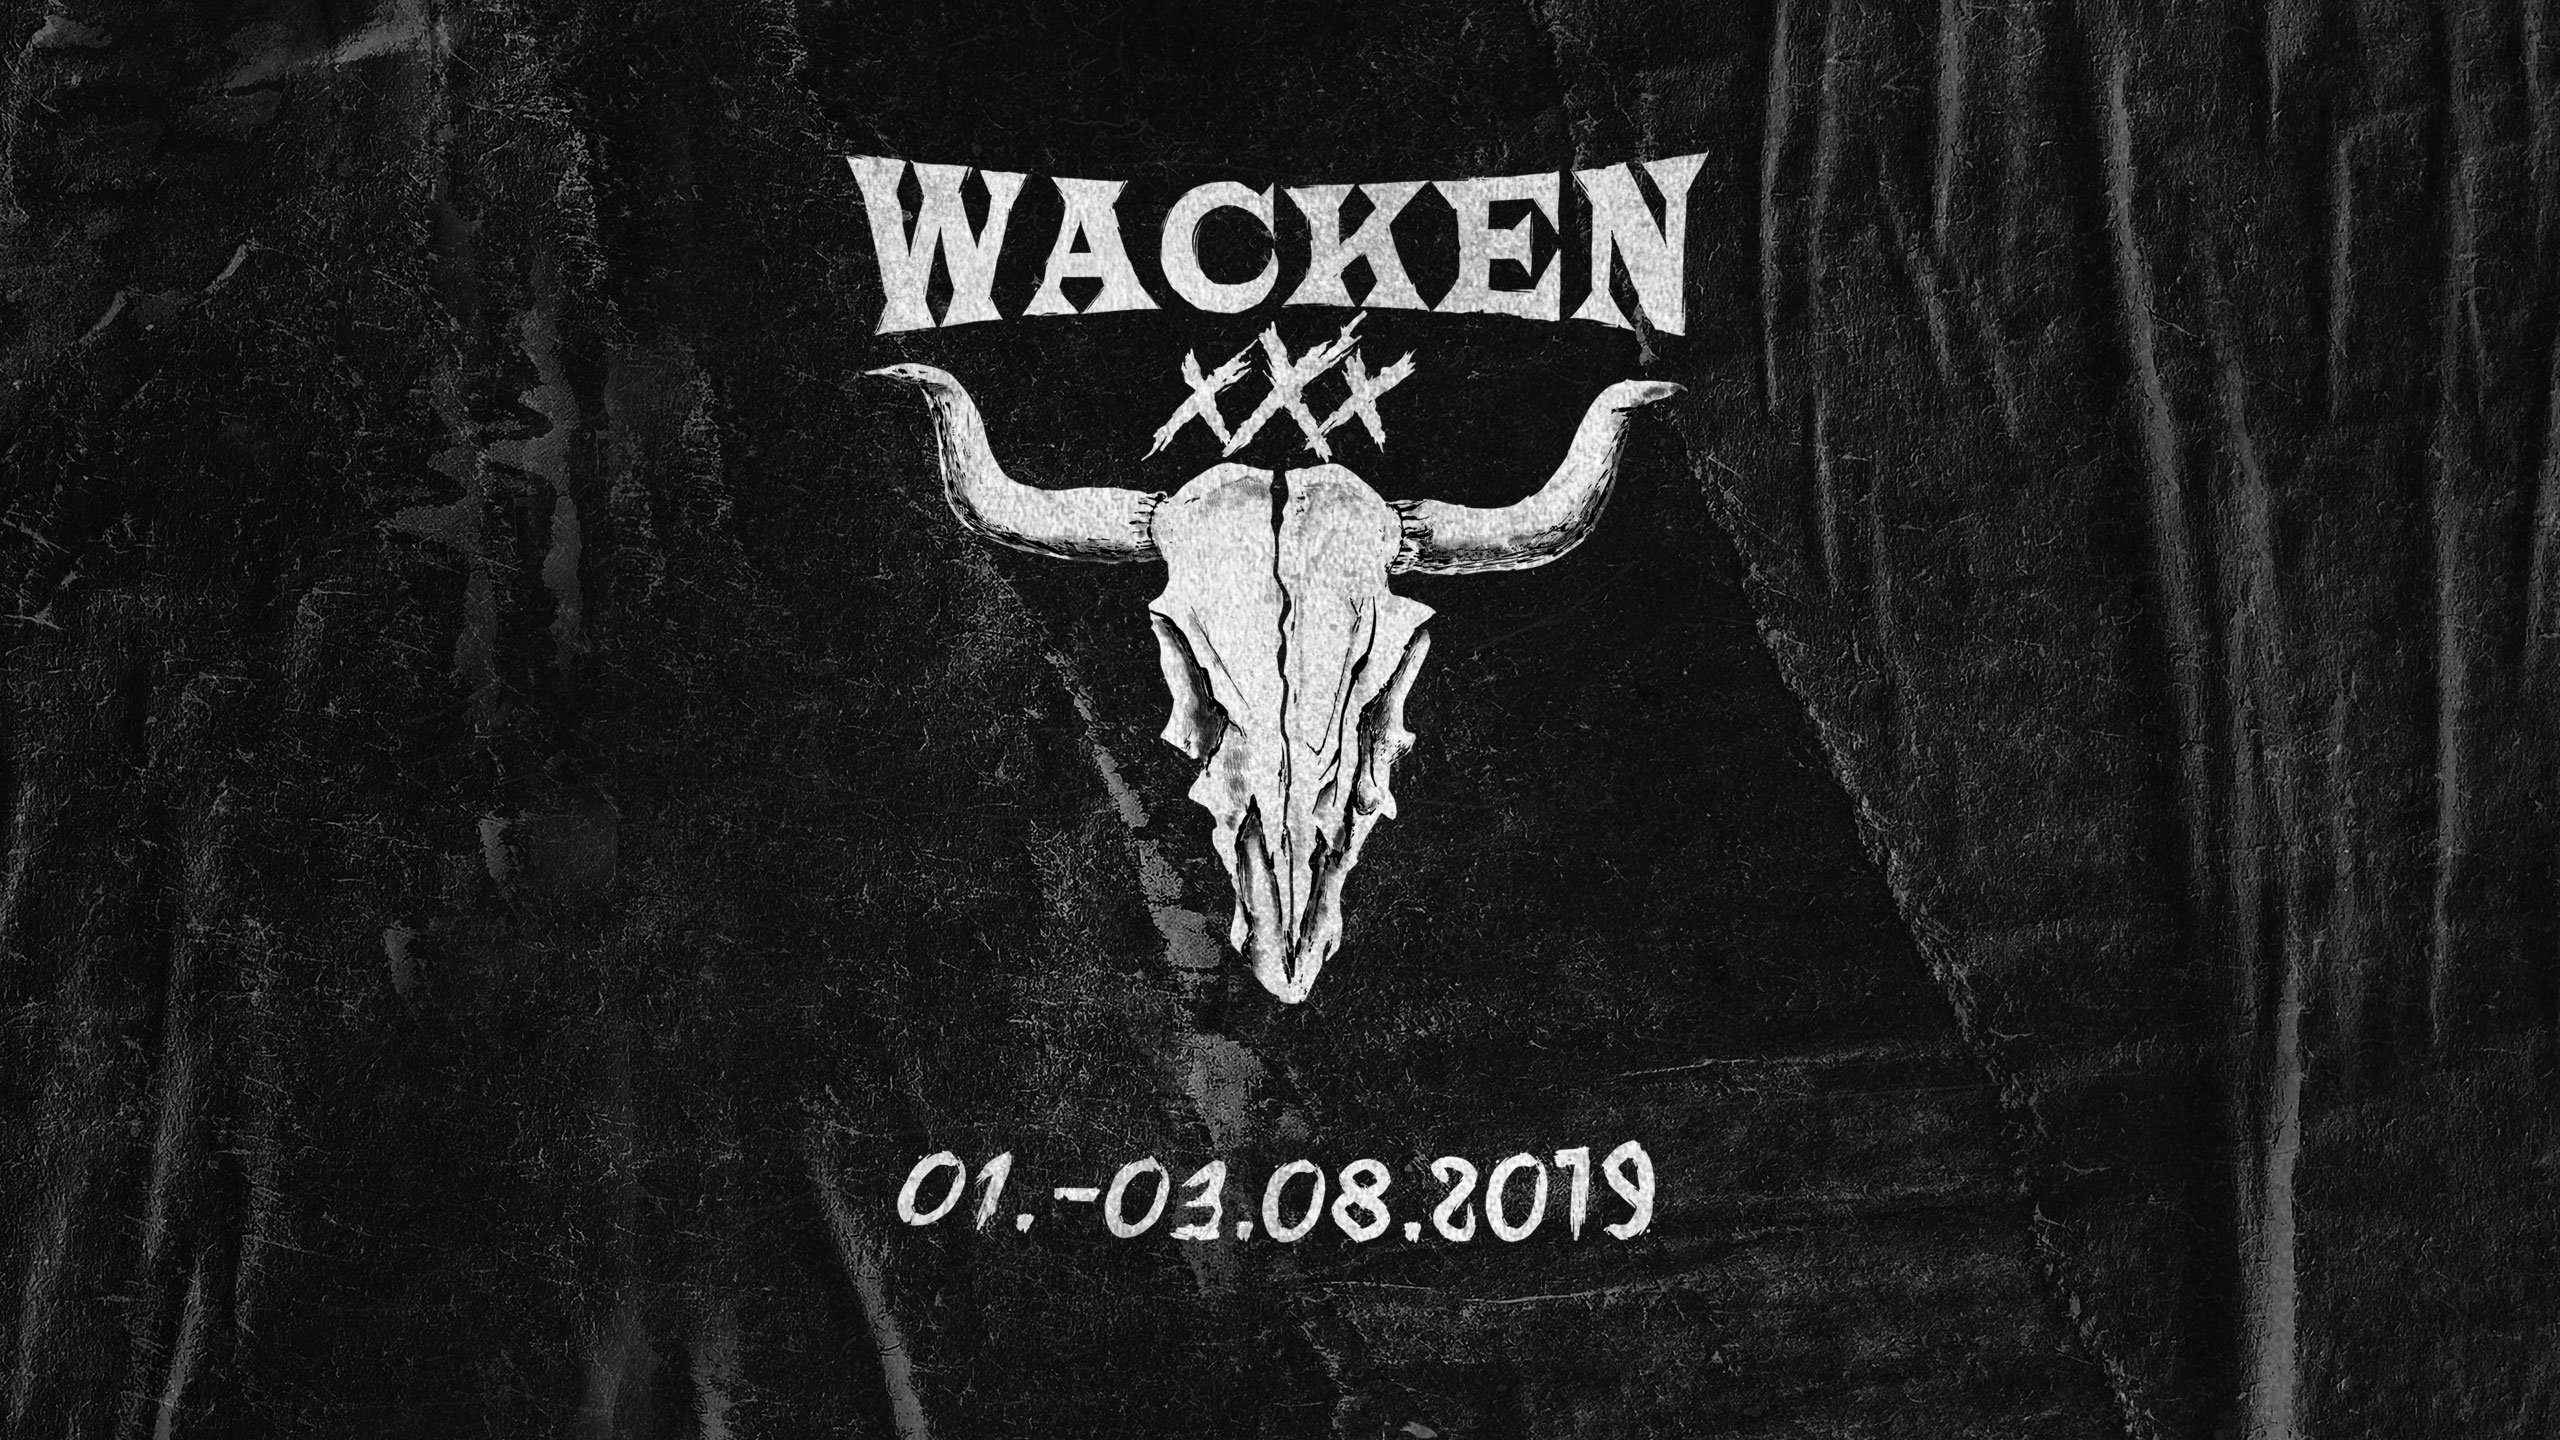 Resultado de imagem para wacken wallpaper